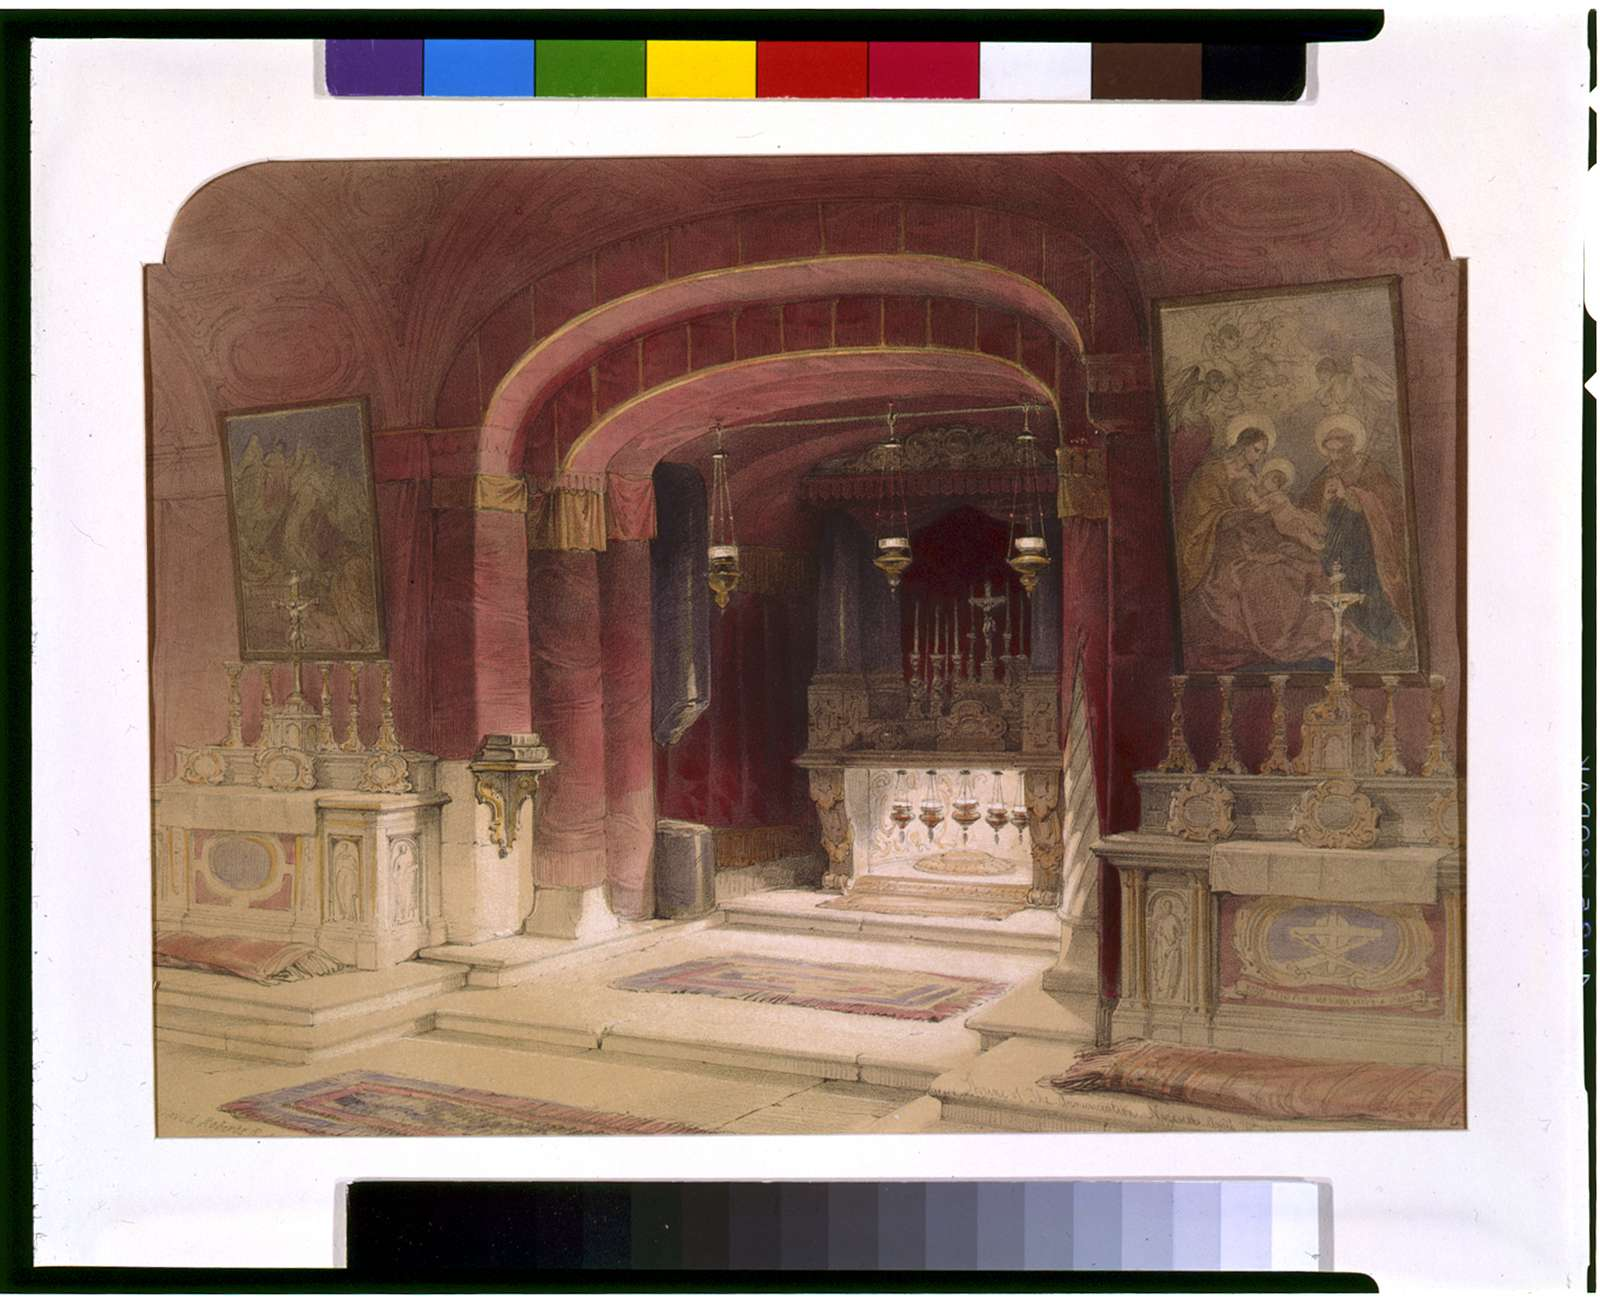 Shrine of the Annunciation Nazareth April 20th 1839 / David Roberts, R.A.